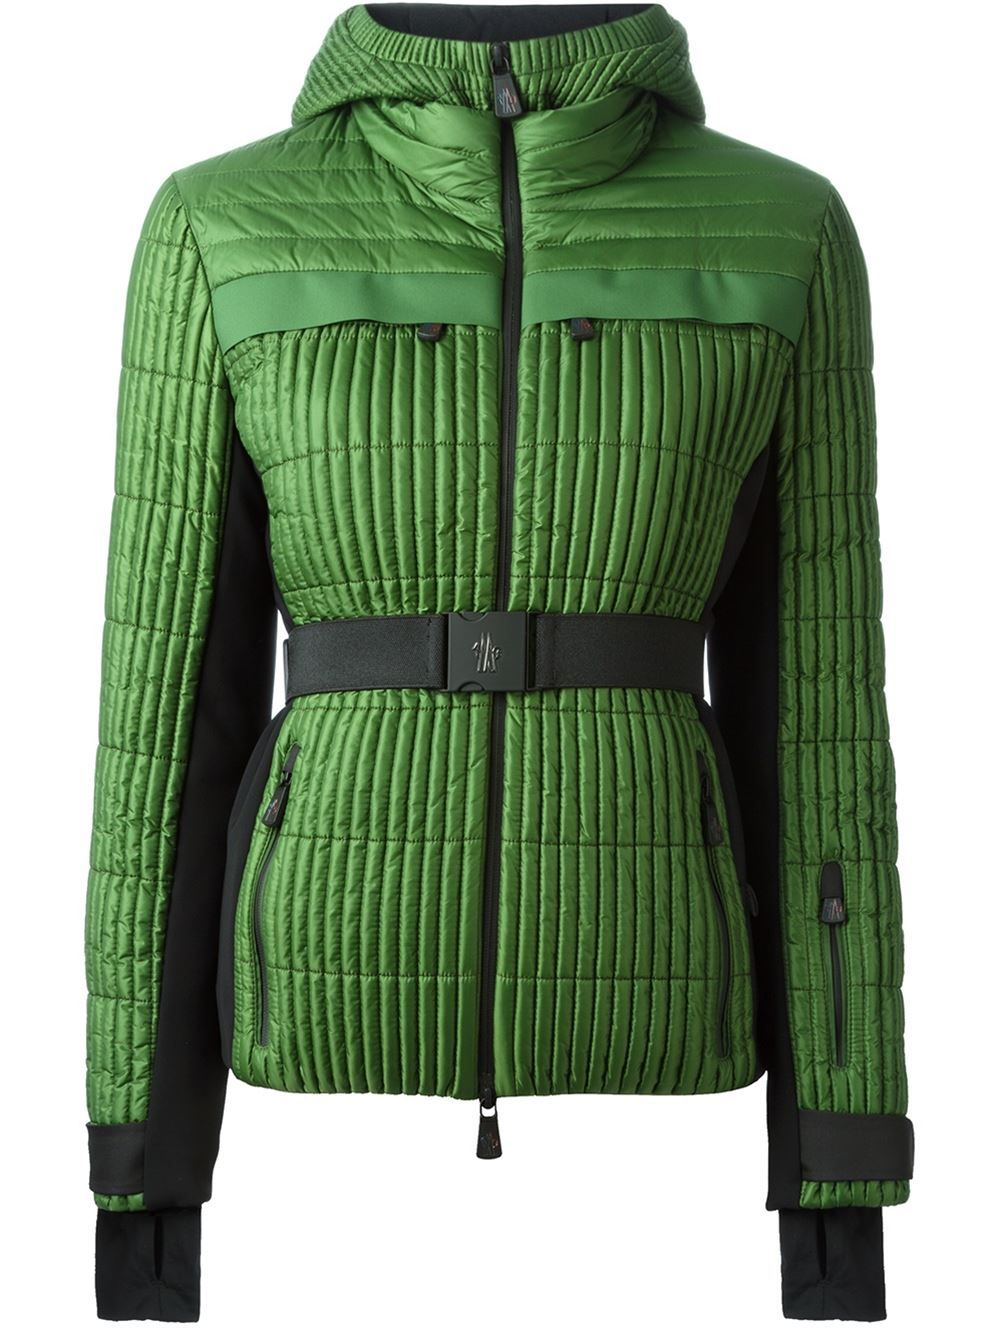 Belted Moncler Padded Grenoble jacket Hooded JacketWinter lcuF3TJK1